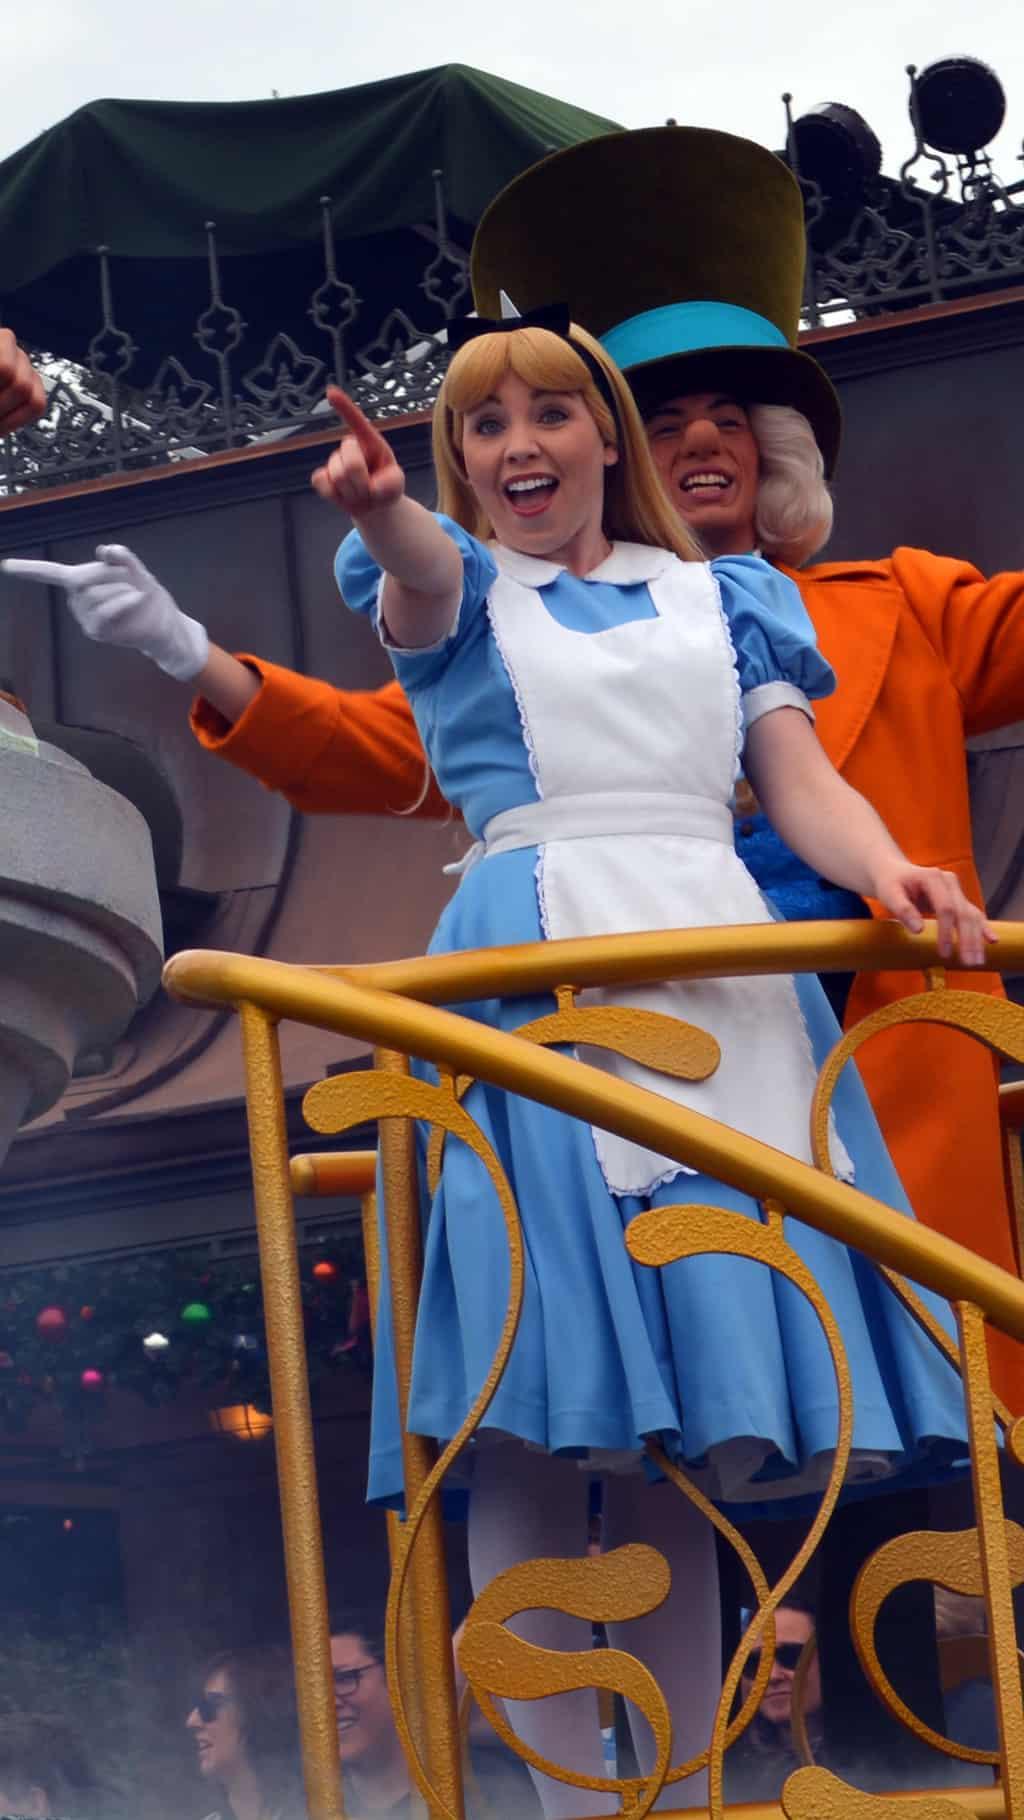 Walt Disney World, Magic Kingdom, Celebrate a Dream Come True Parade, Alice in Wonderland, Mad Hatter